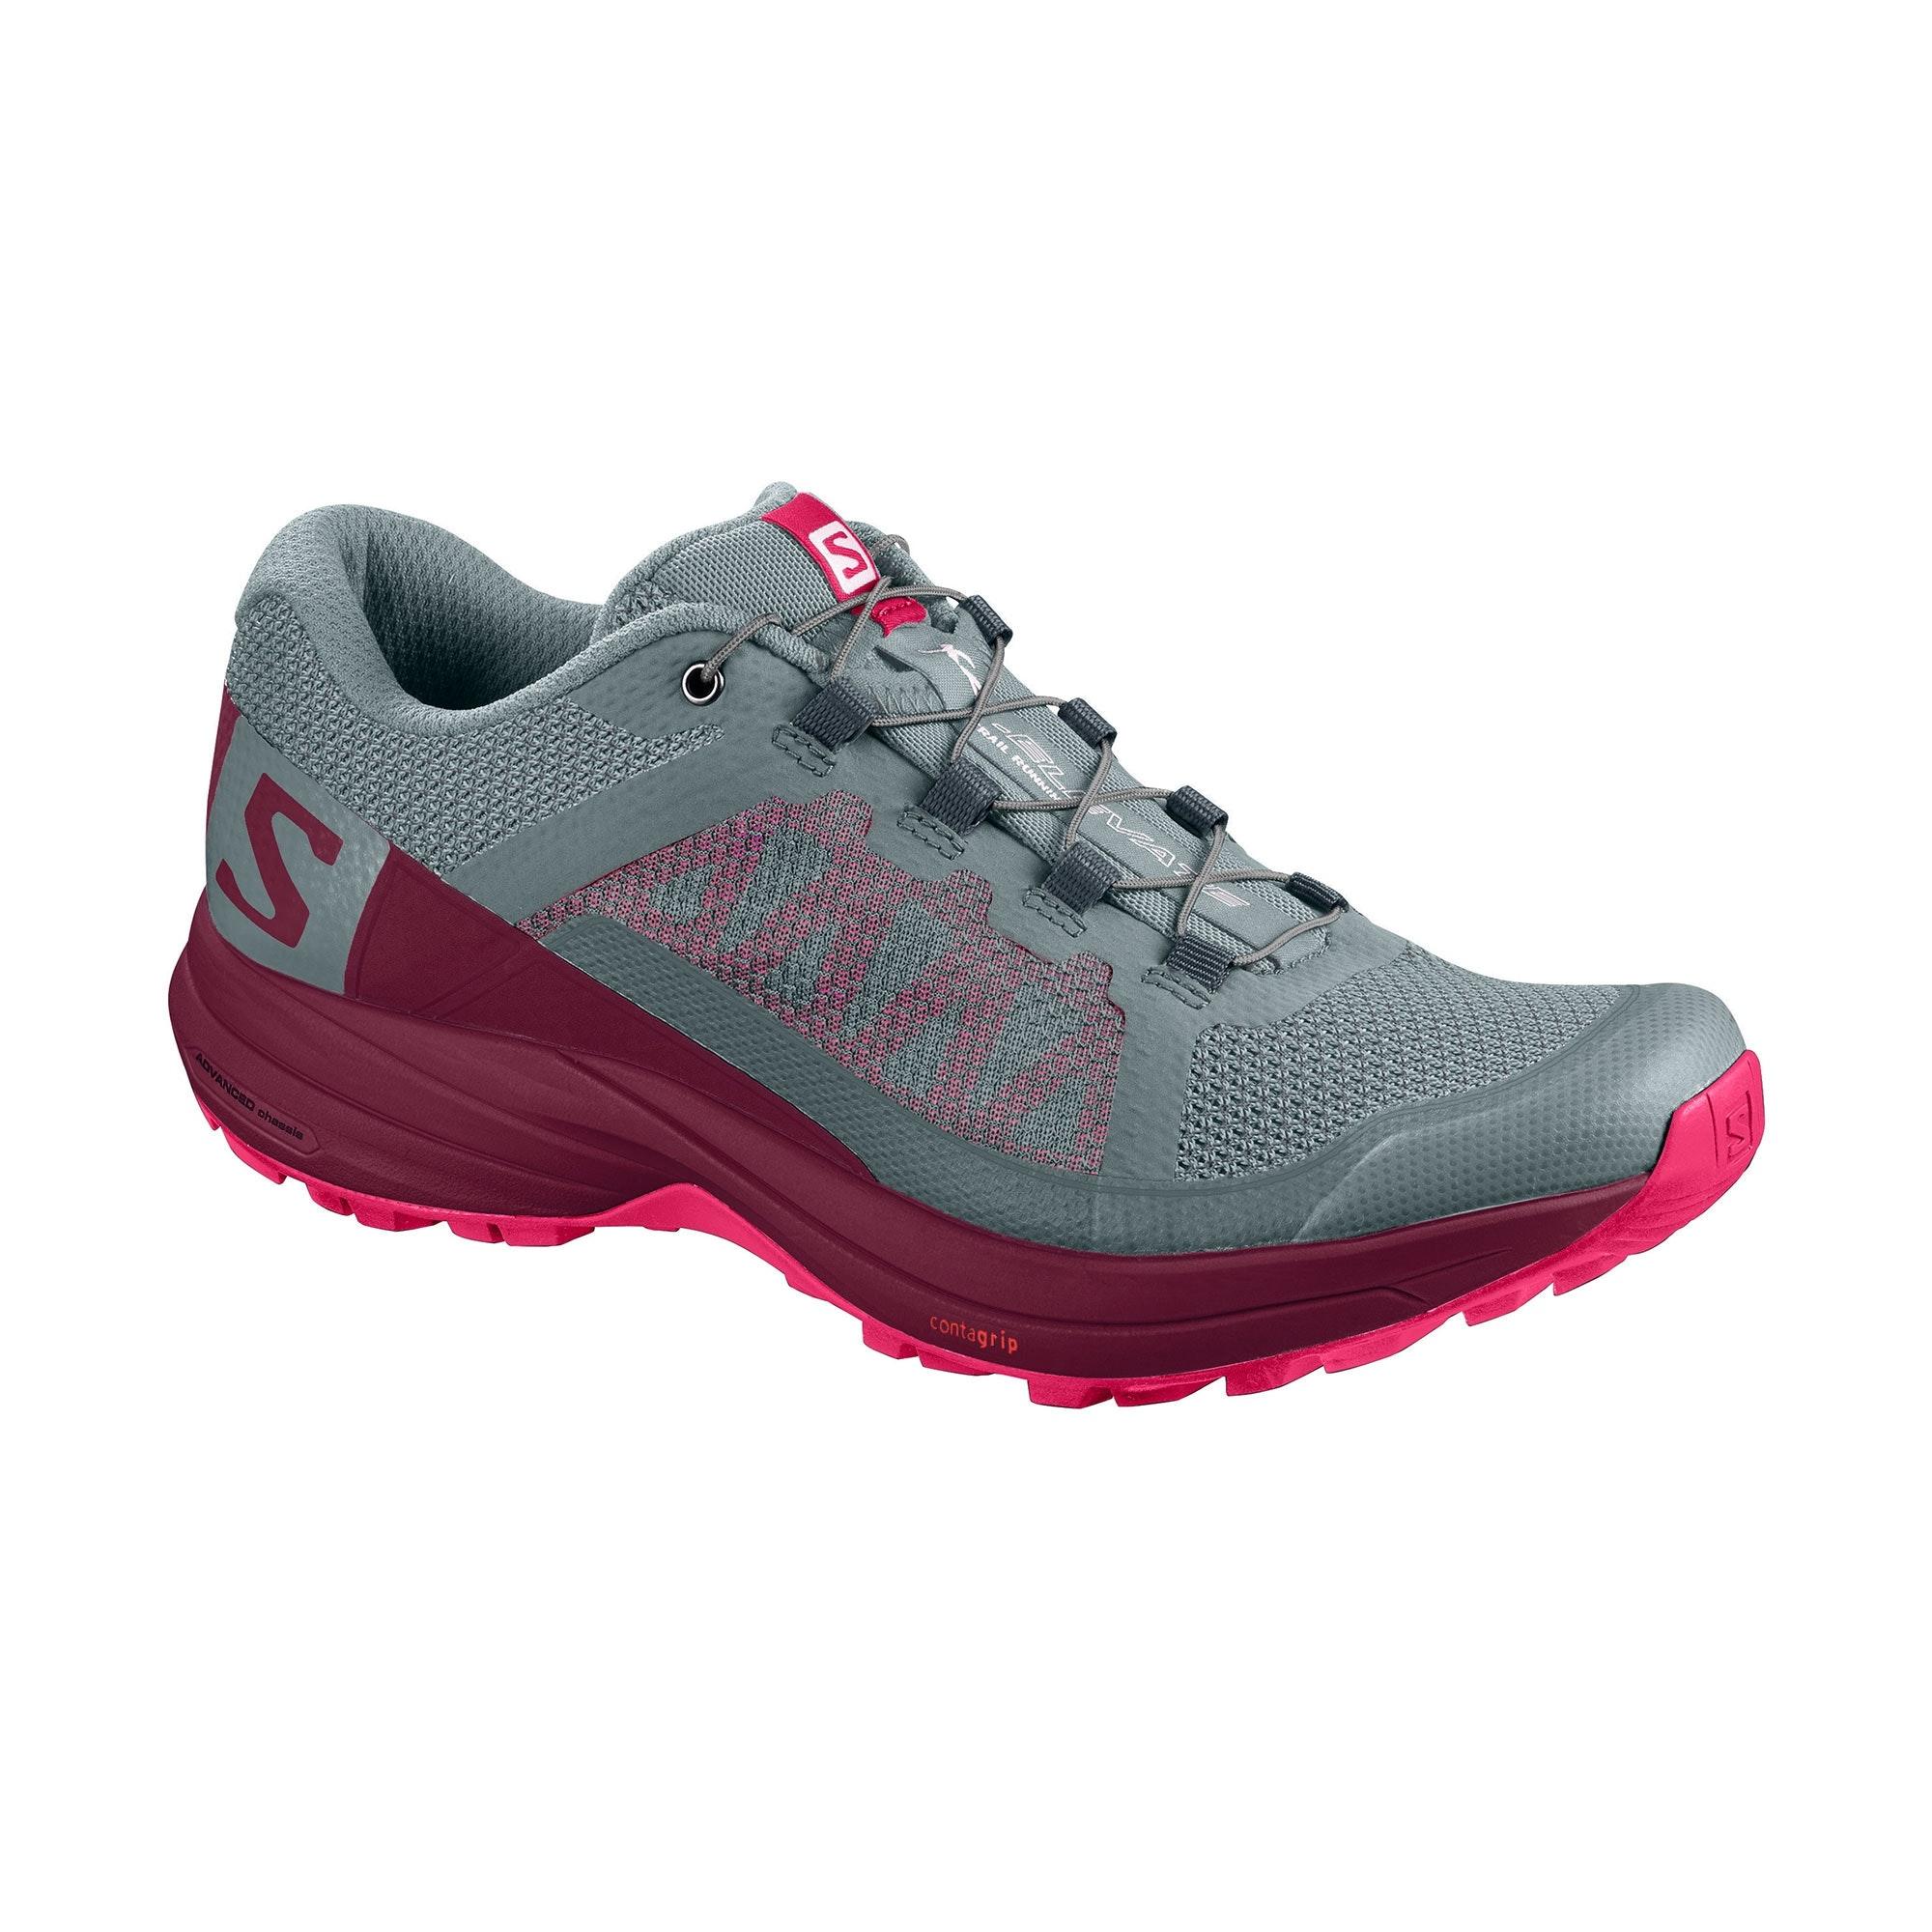 Shoes Women's Trail Salomon Elevate Running Xa l1KuF5JcT3